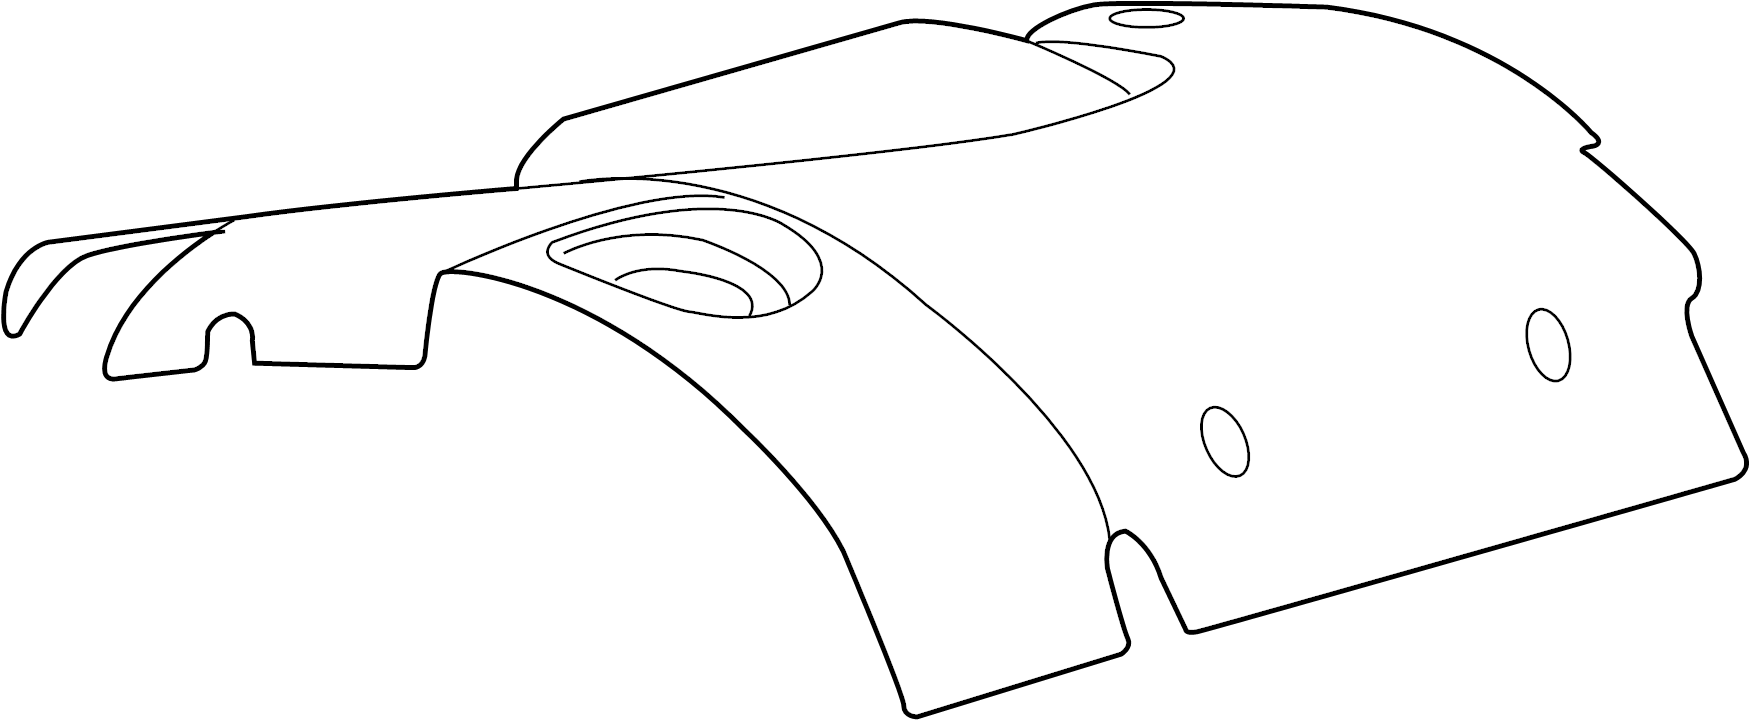 jaguar s-type cover - engine  engine cover  3 0 liter  rover  rear  land  front